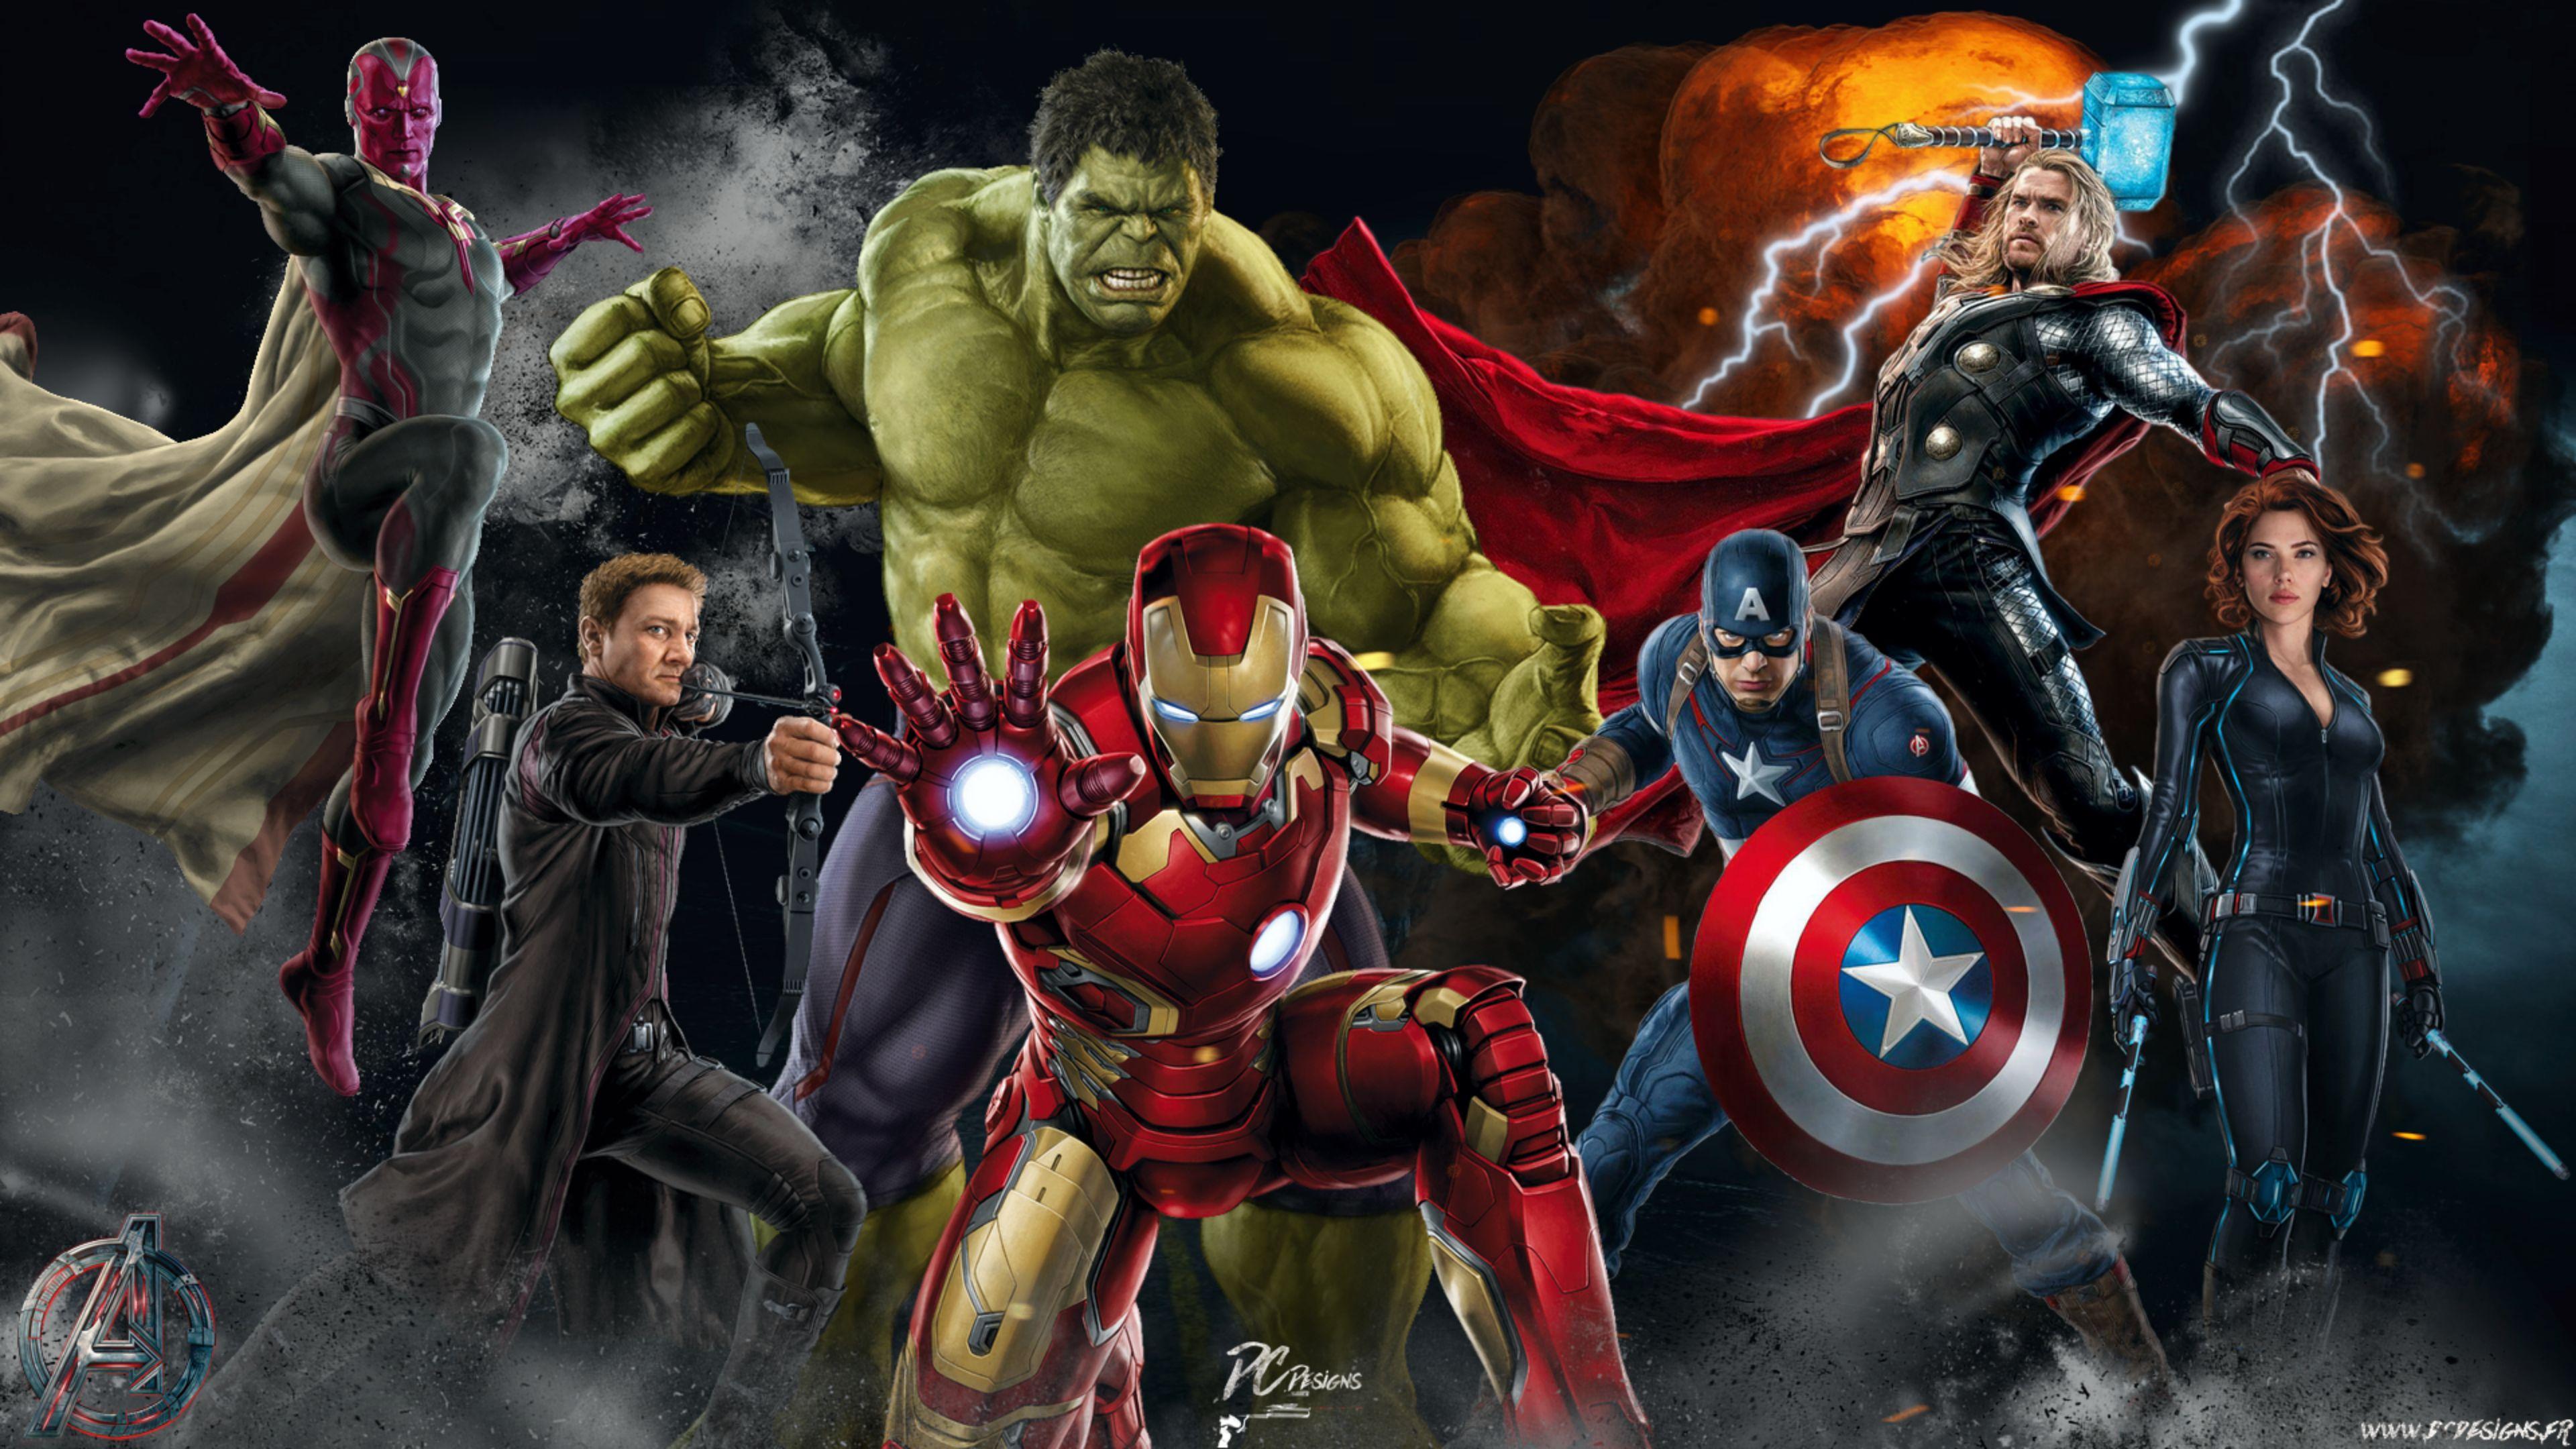 Avengers Age Of Ultron Tony Stark iron Man Ultra Hd 4k Wallpaper 3840x2160  Wallpapers13com